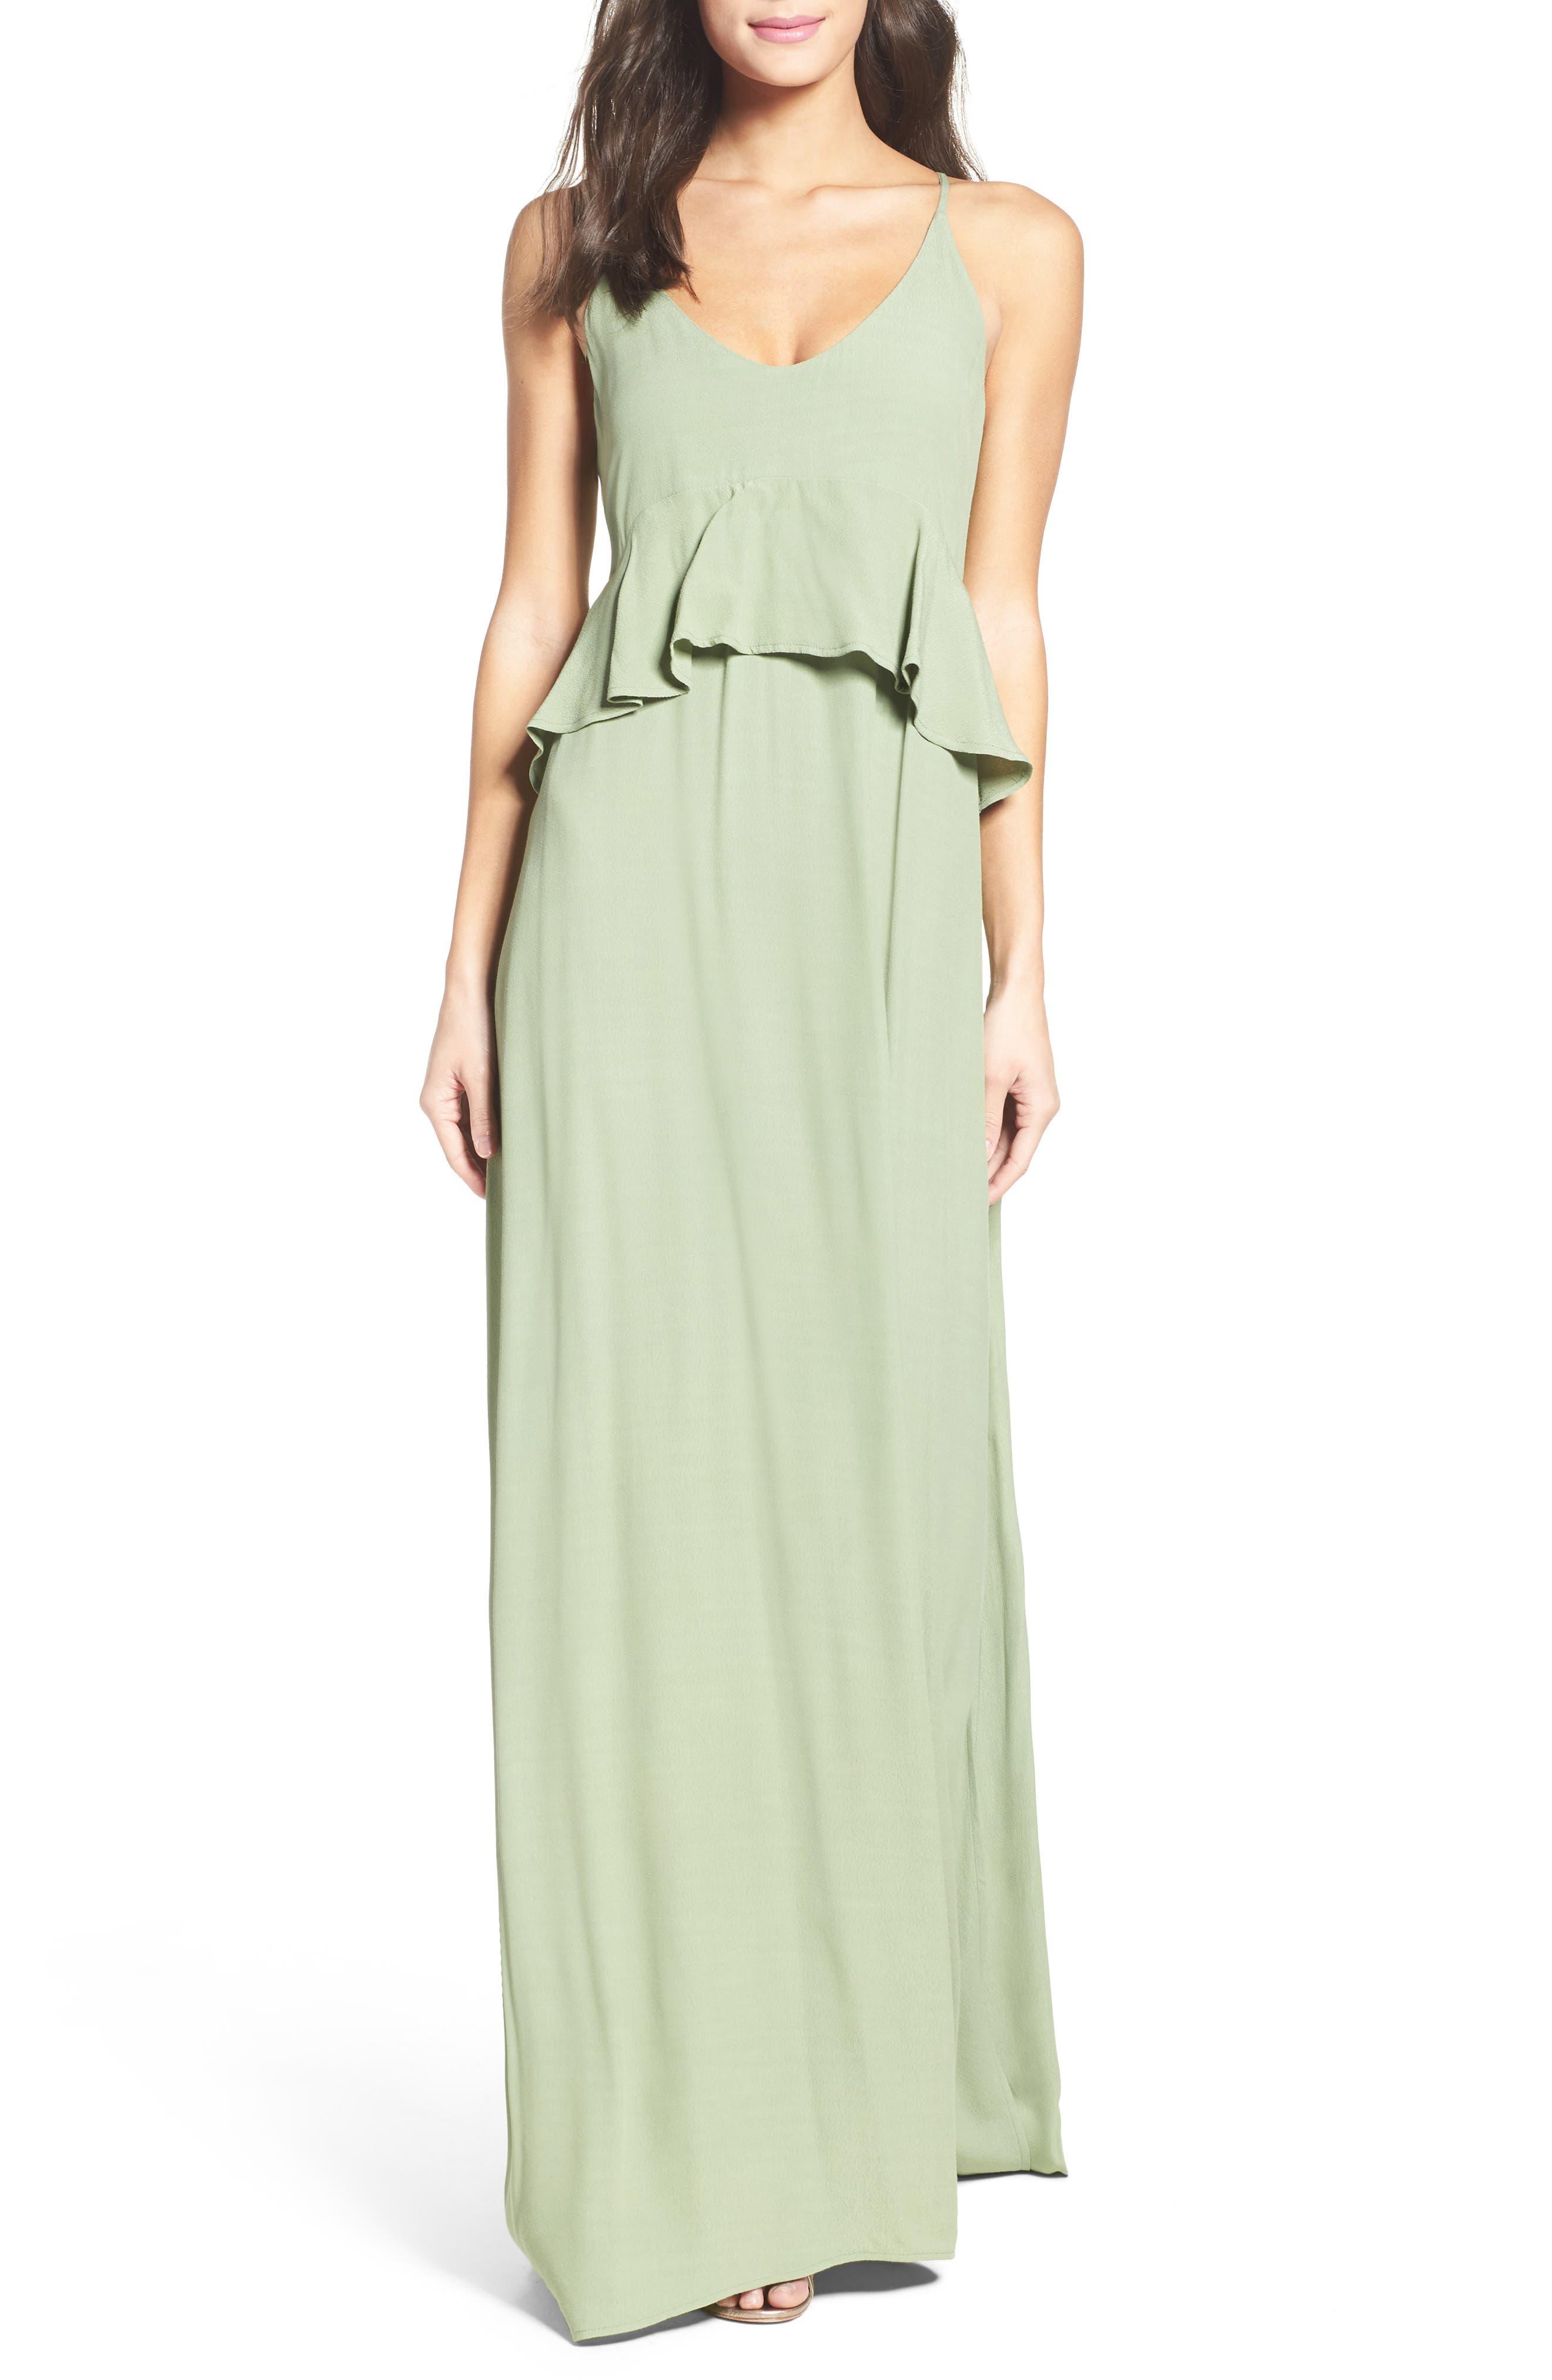 Roe + May Jolie Crepe Peplum Dress,                         Main,                         color, 310